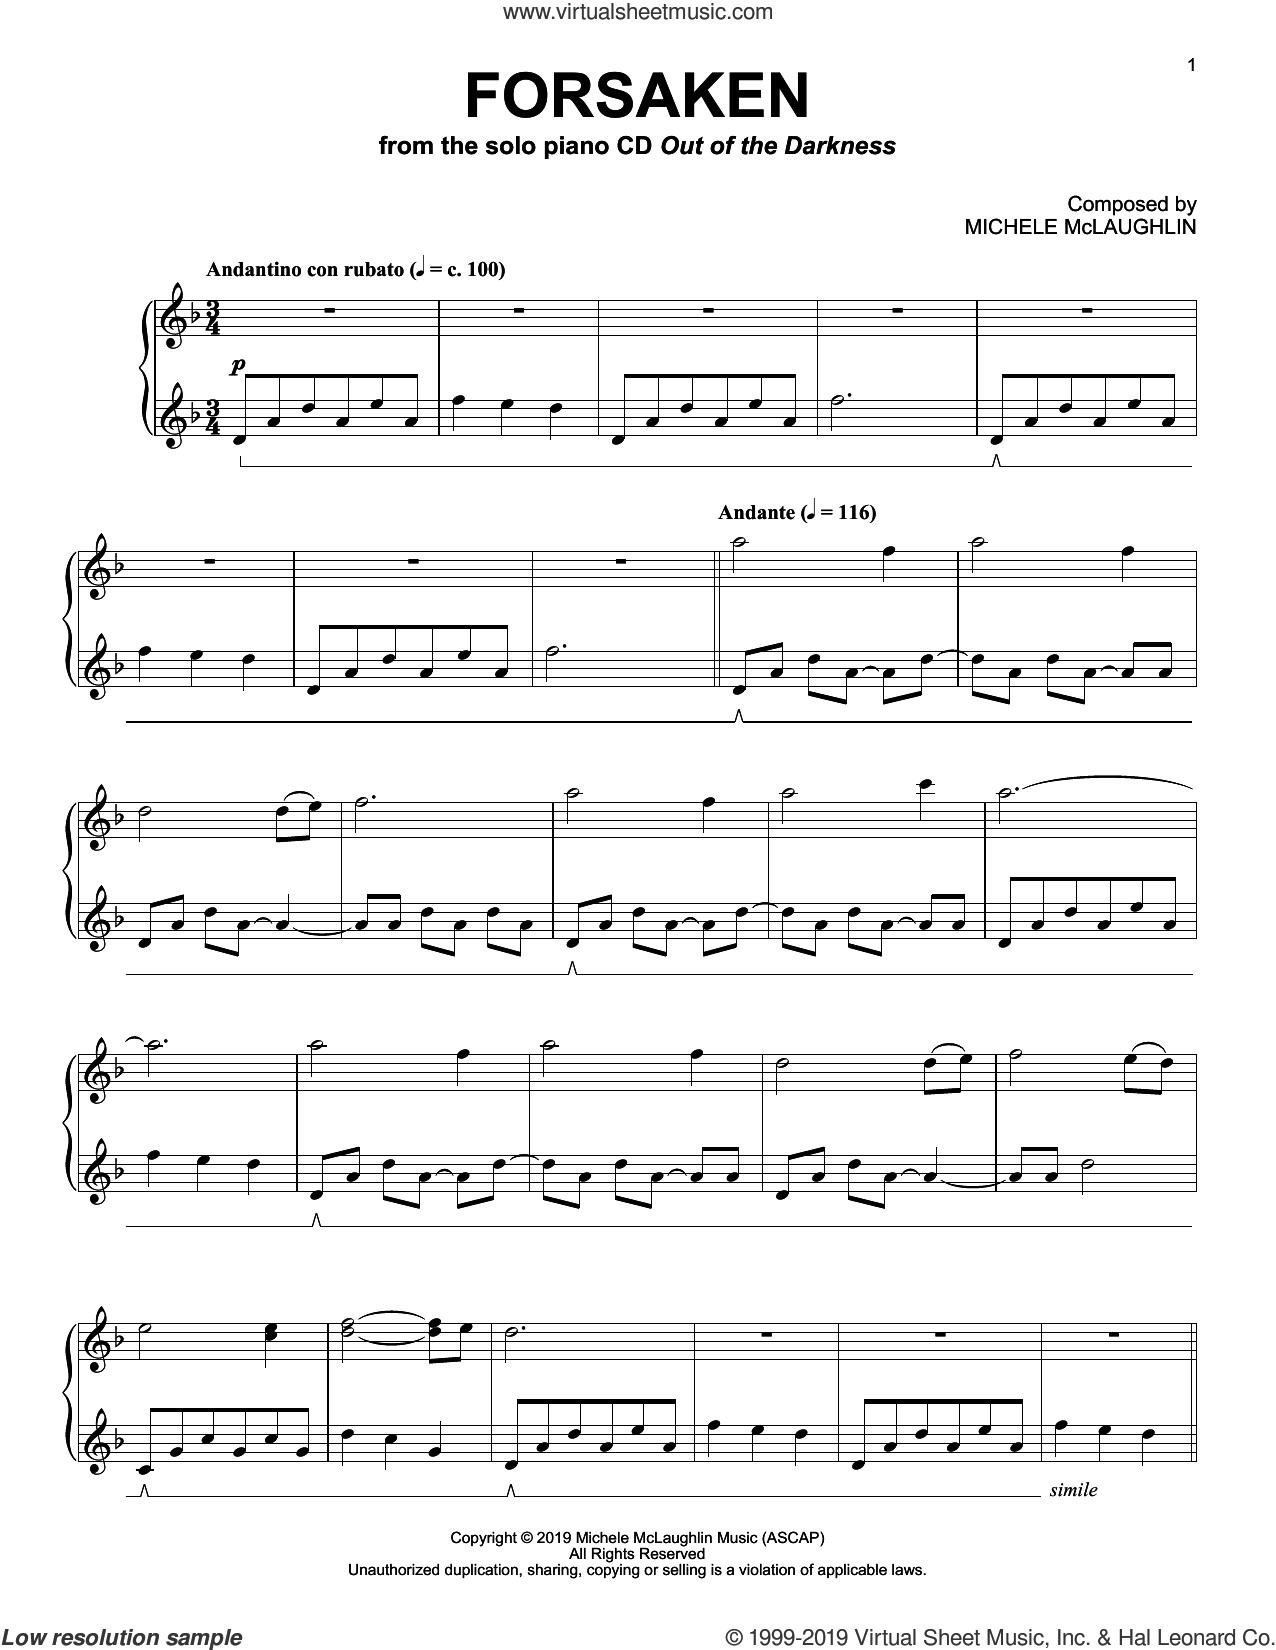 Forsaken sheet music for piano solo by Michele McLaughlin, intermediate skill level